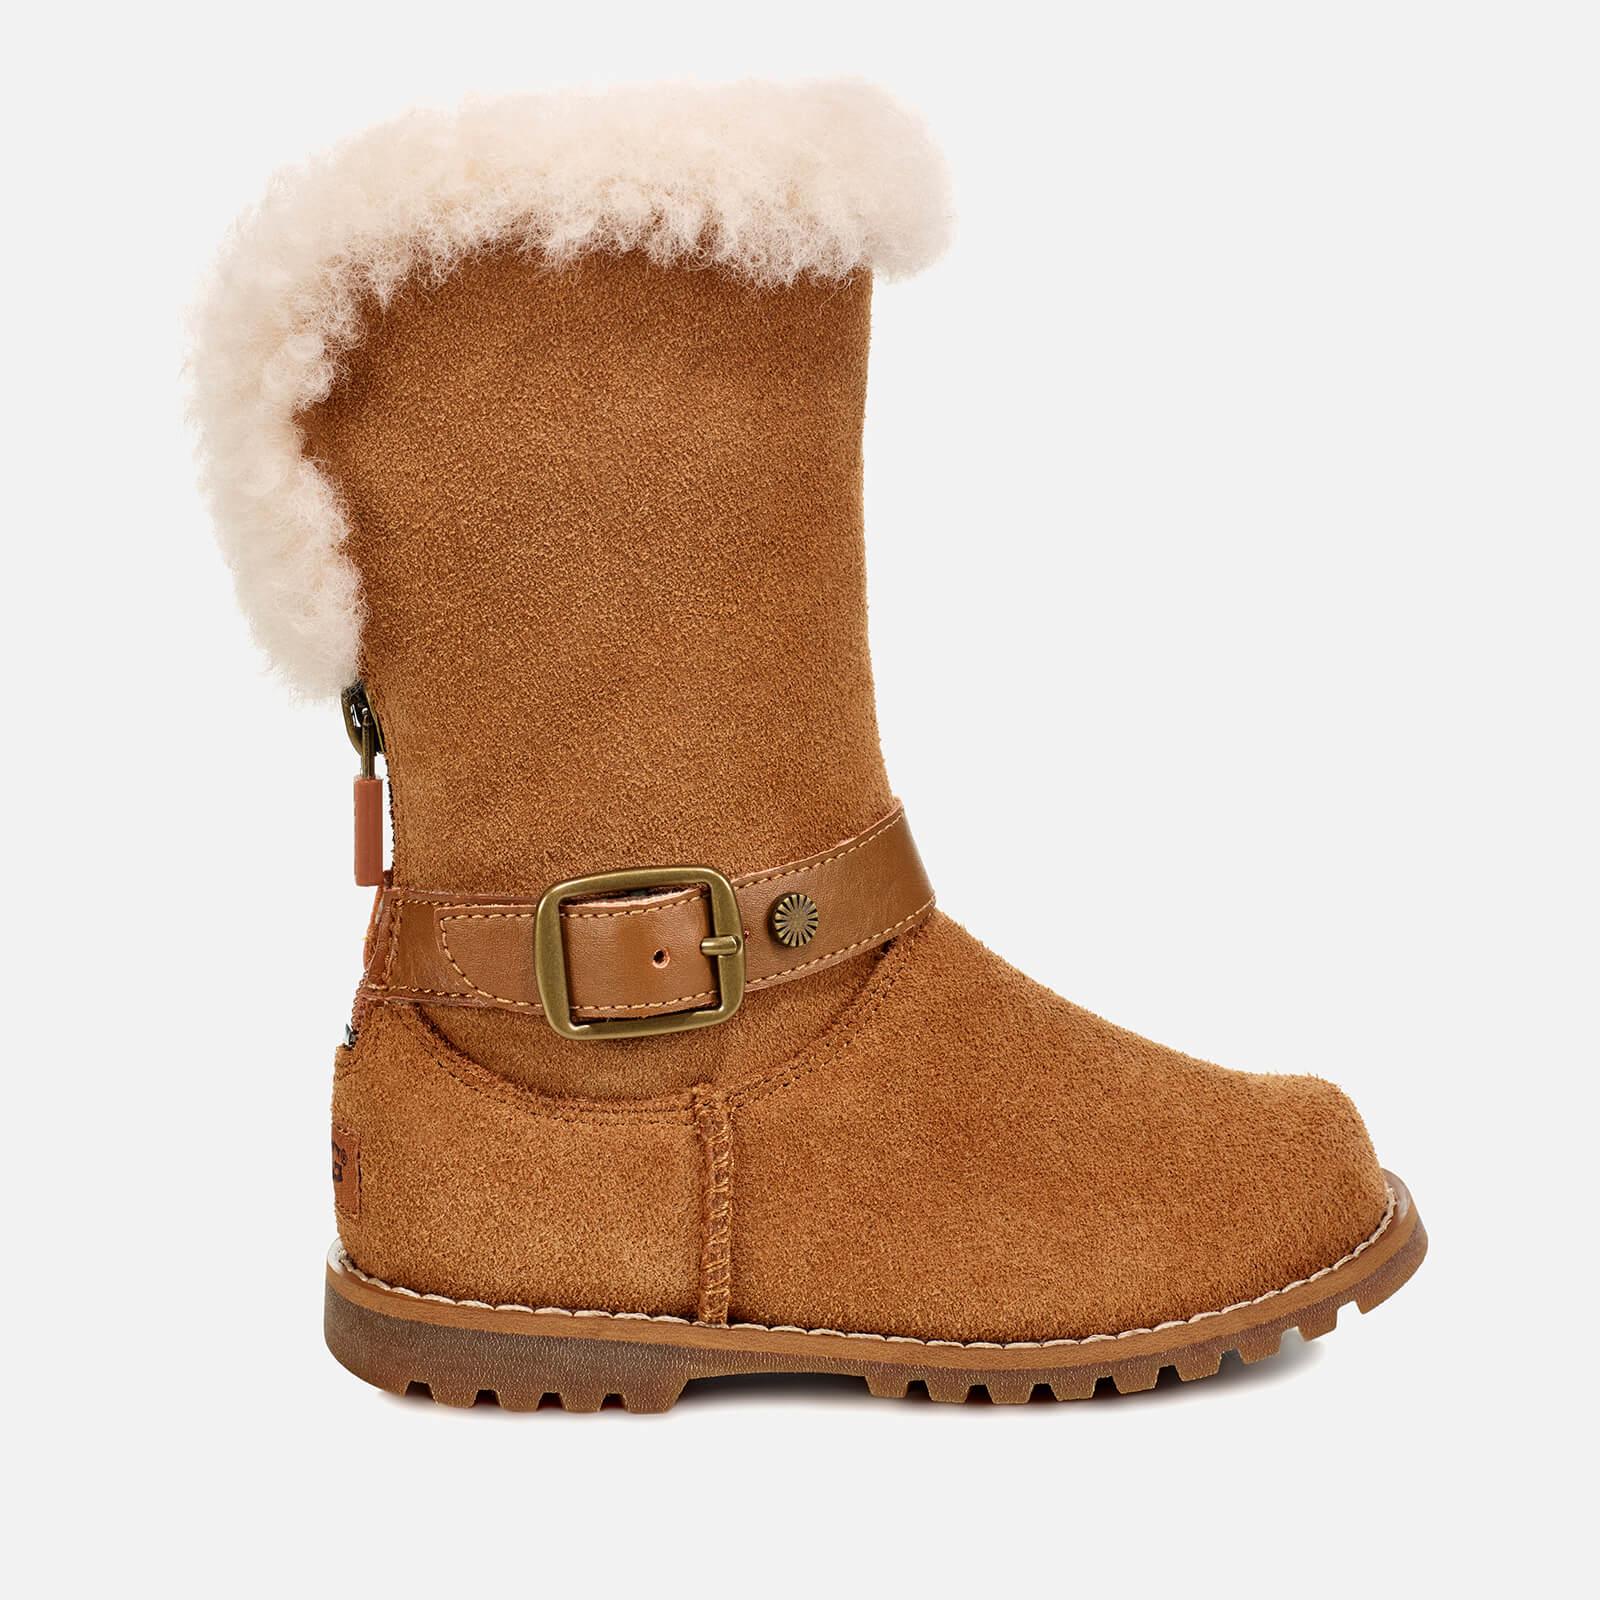 de60f8d654f UGG Kid's Nessa Suede Buckle Boots - Chestnut